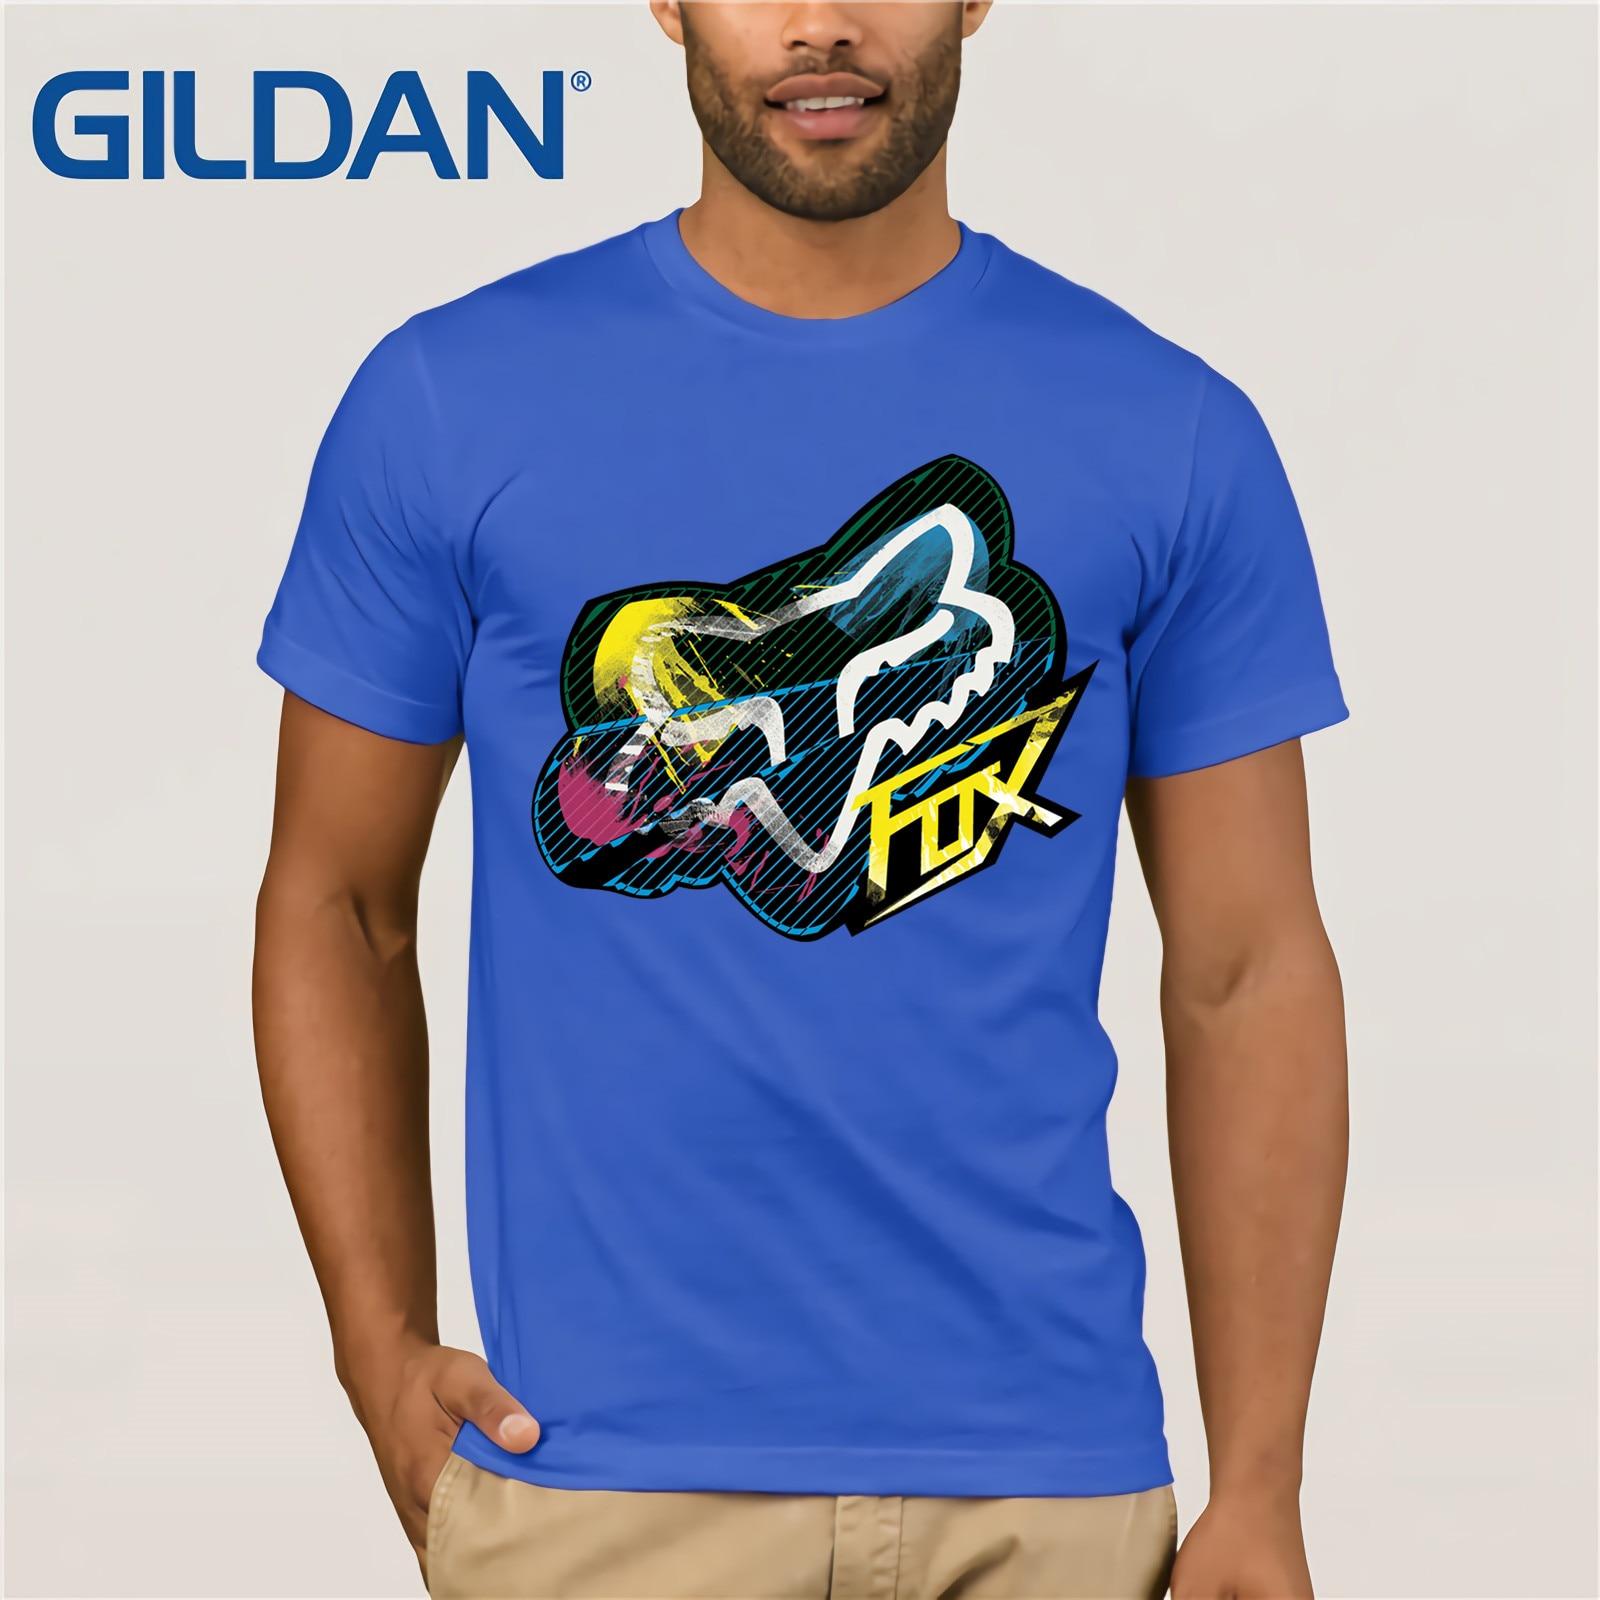 Fox Mtb Ranger Cntr Mens T-shirt - Black All Sizes Mens 2019 Fashion Brand T Shirt O-Neck 100%cotton T-Shirt Tops Tee Cool